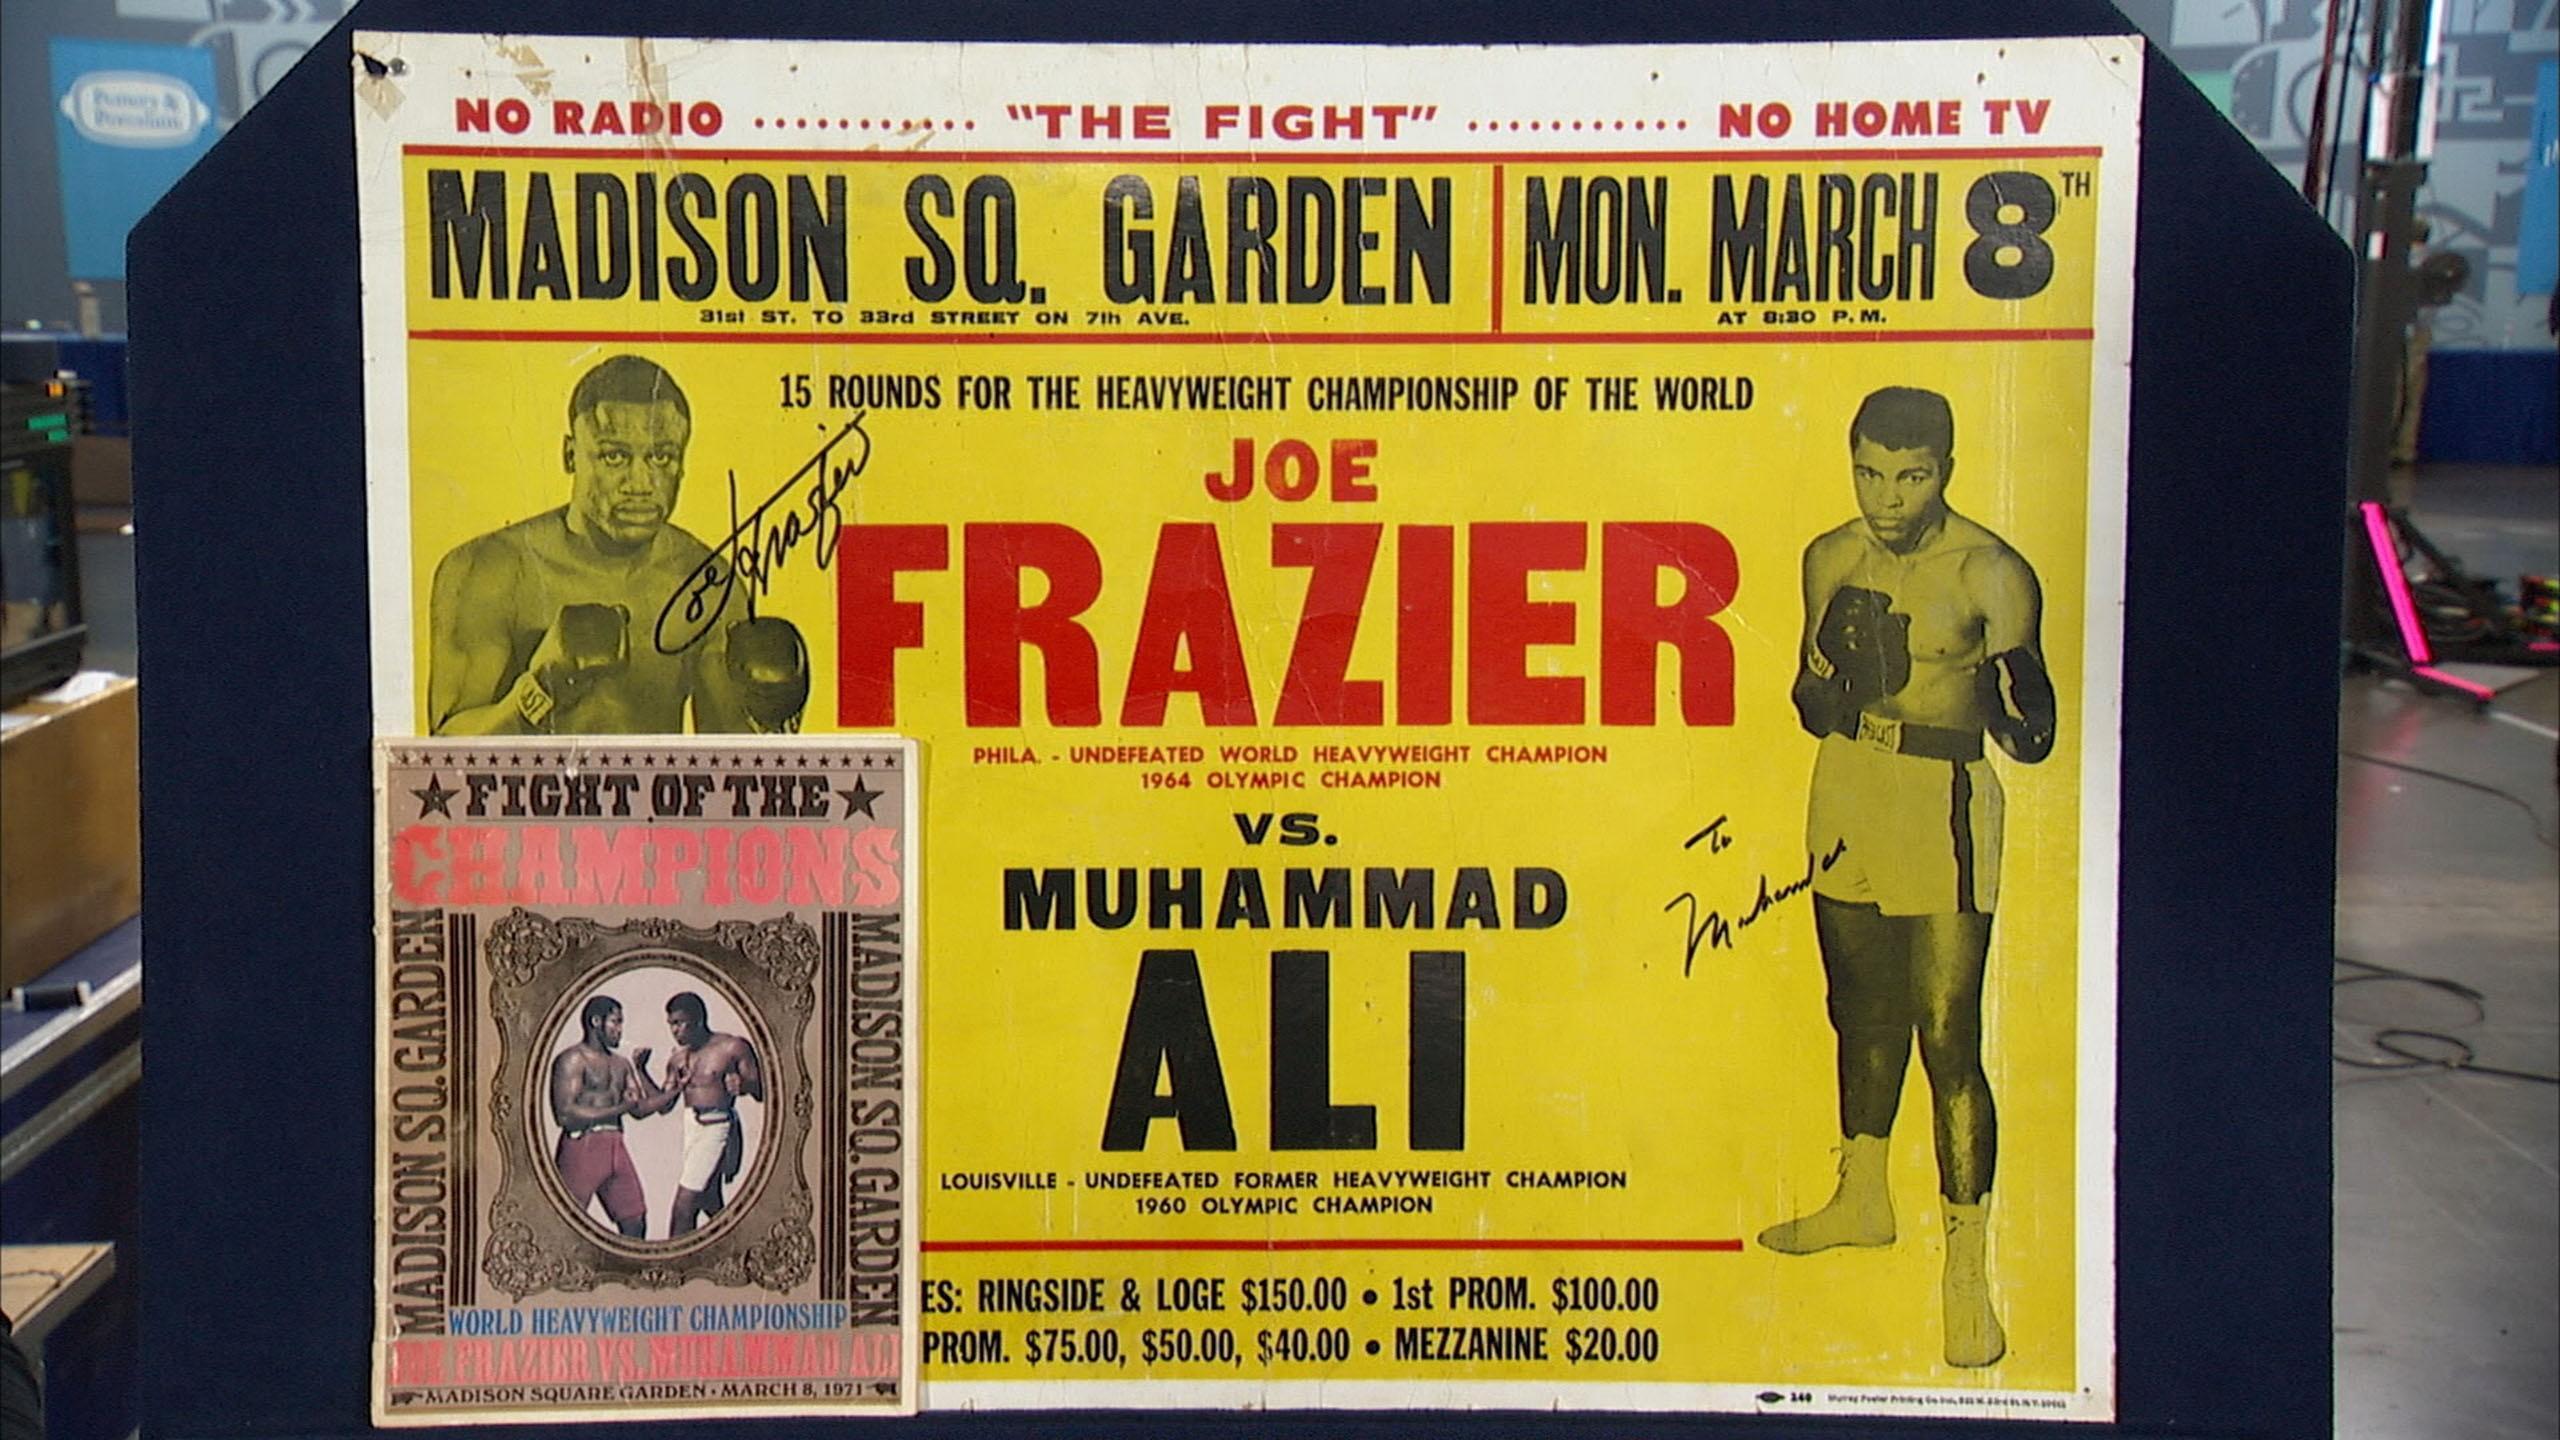 Appraisal: Signed Muhammad Ali & Joe Frazier Poster